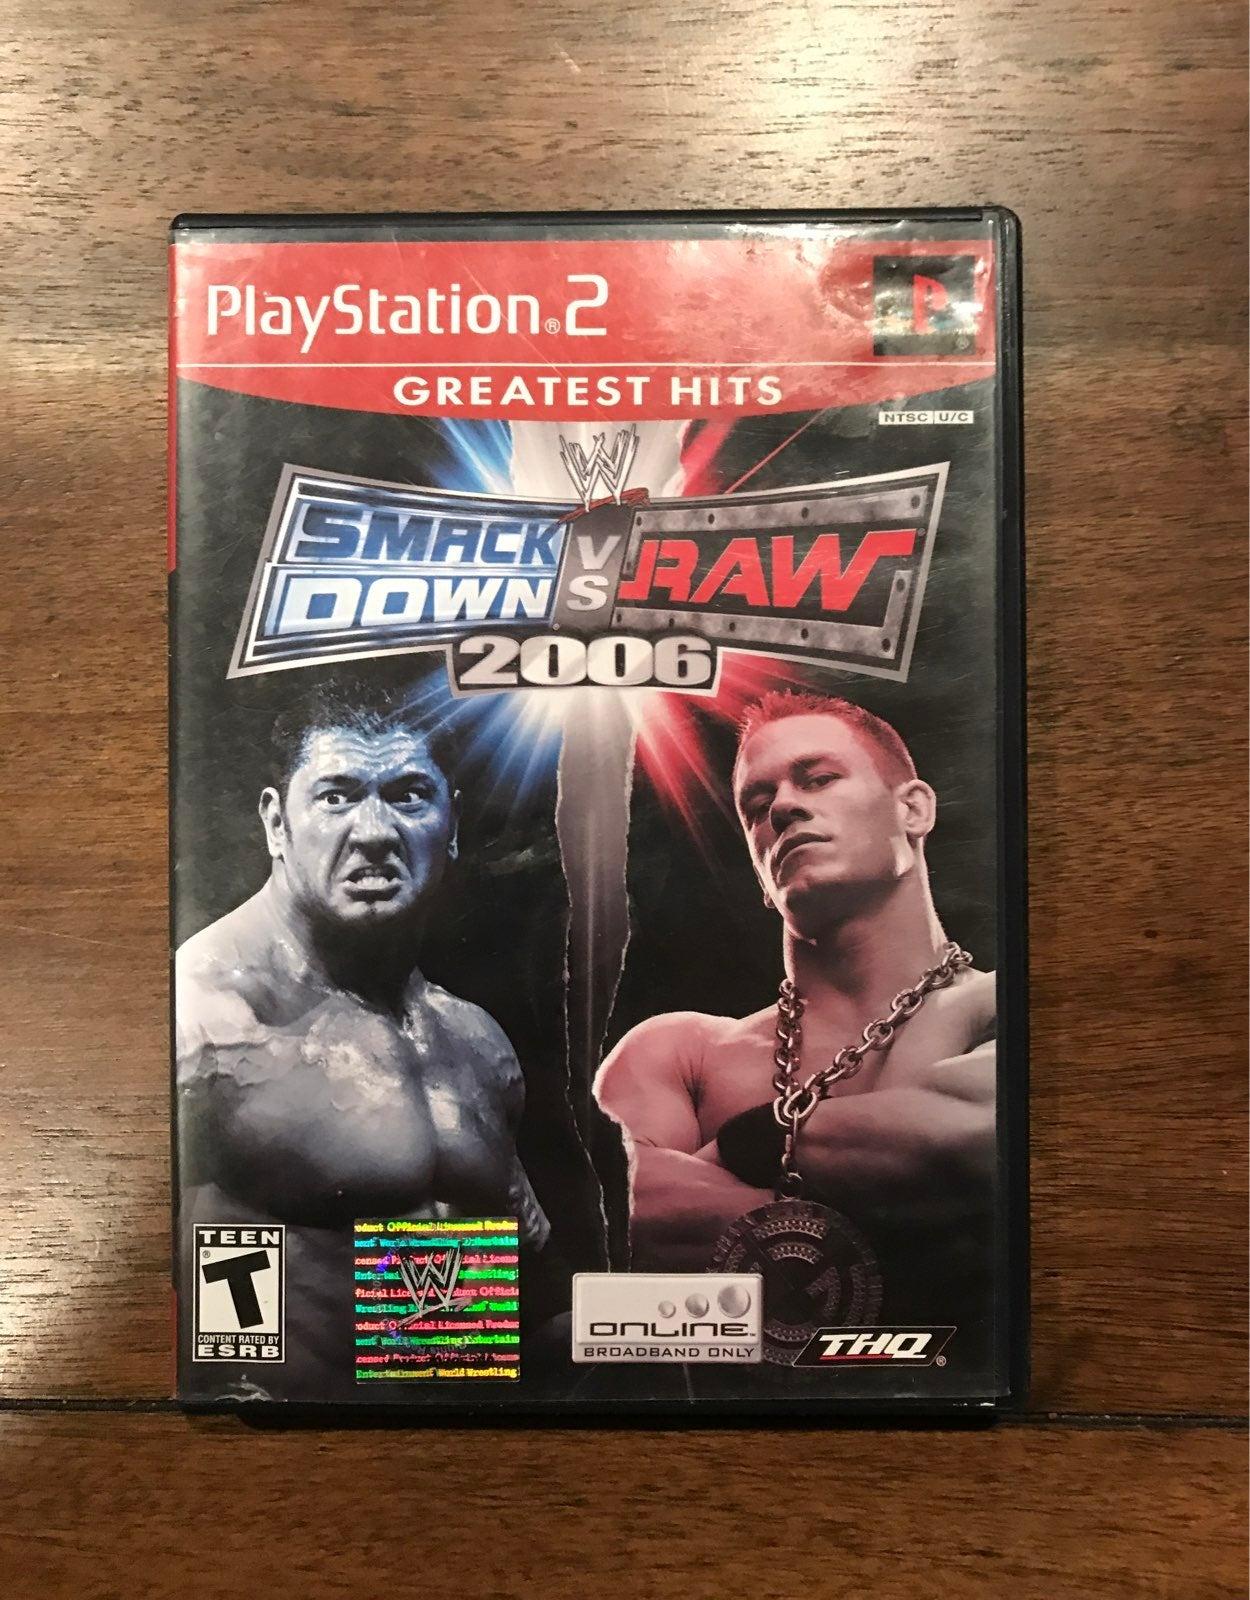 WWE SmackDown vs. Raw 2006 ps2